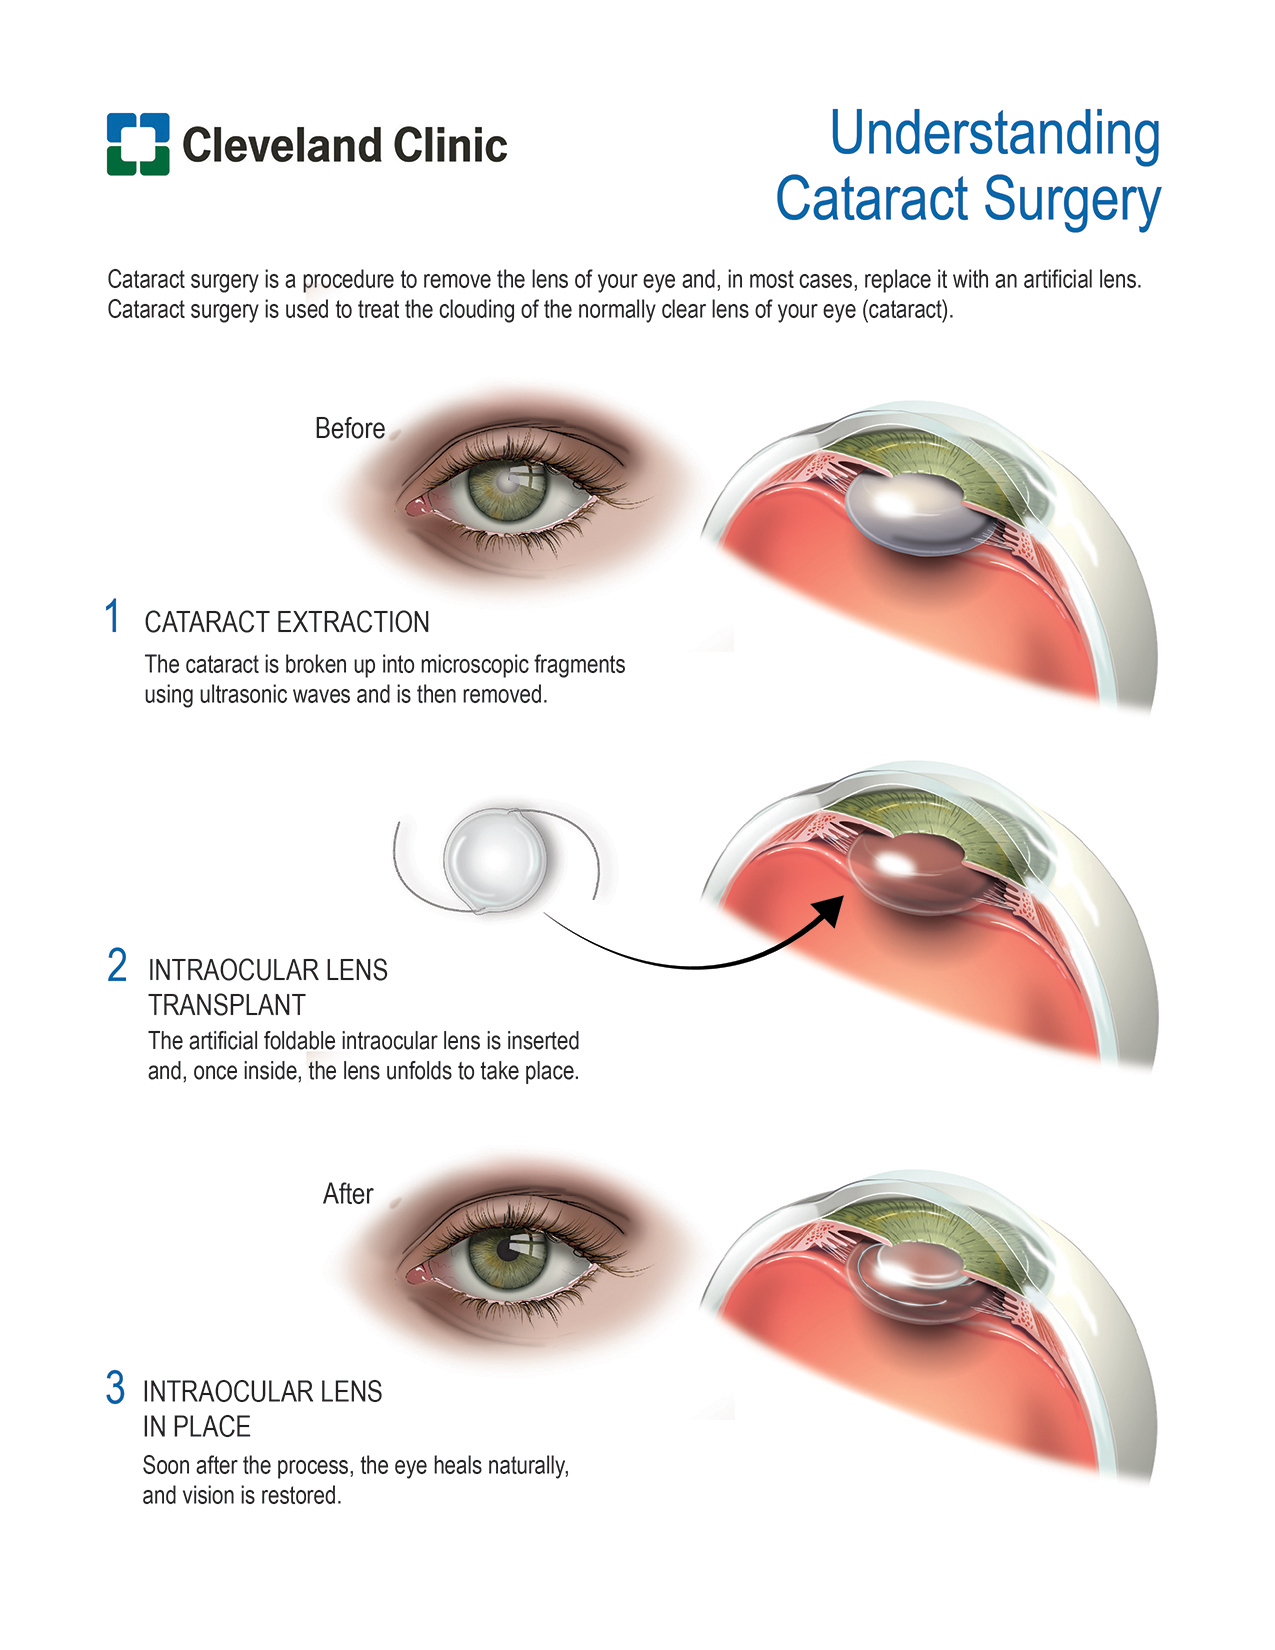 Patient Education: Cataract Surgery